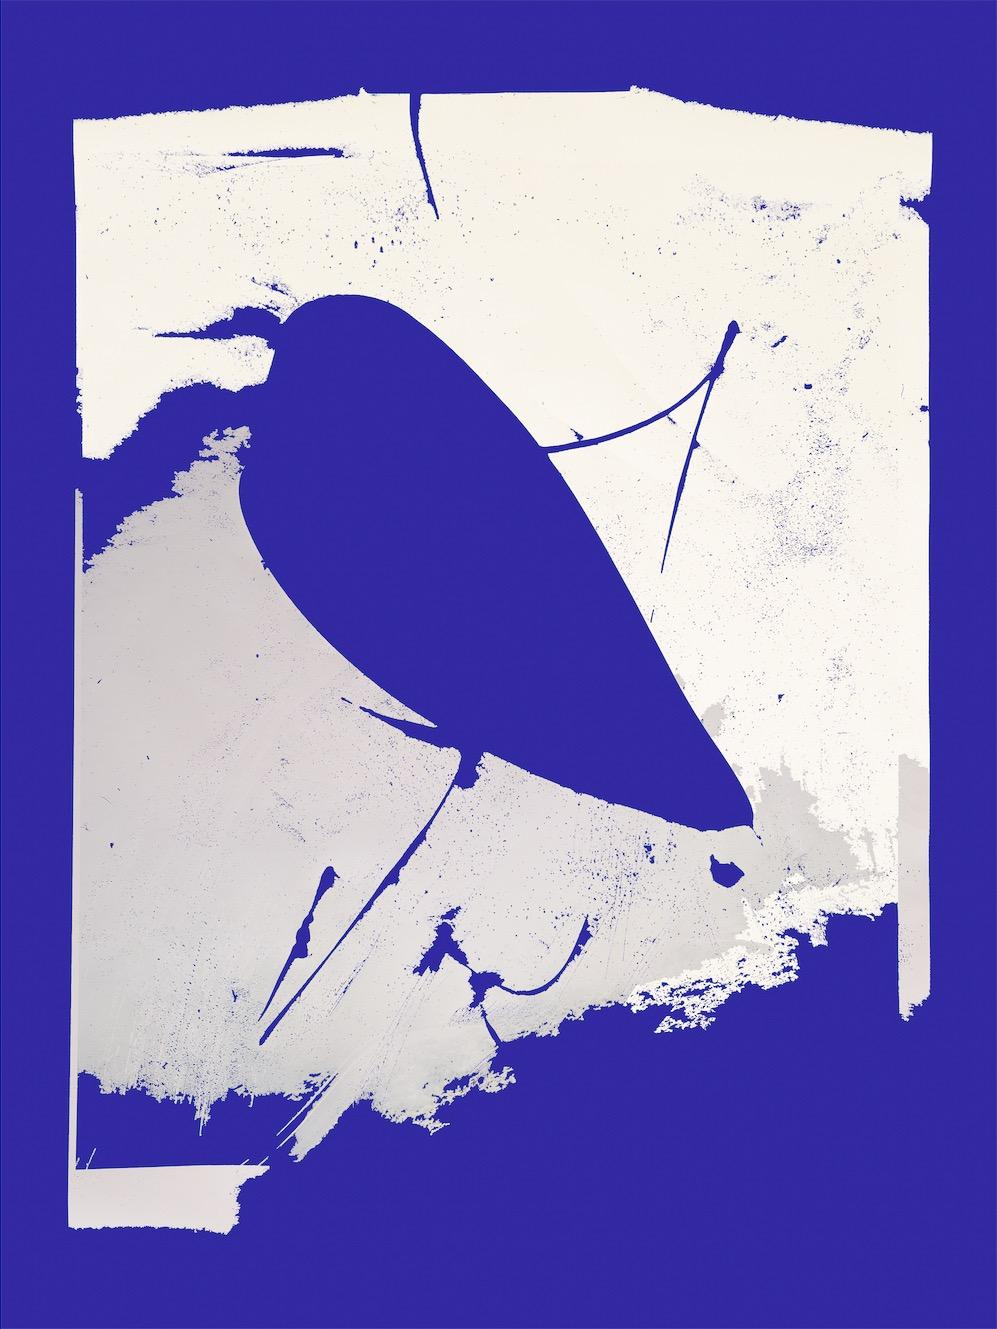 Monochrome (True Mars Blue), Facing the Ocean 0101, 2019, Archival pigment print on paper, 60 x 45 cm, Edition of 3 plus 2 artist's proofs